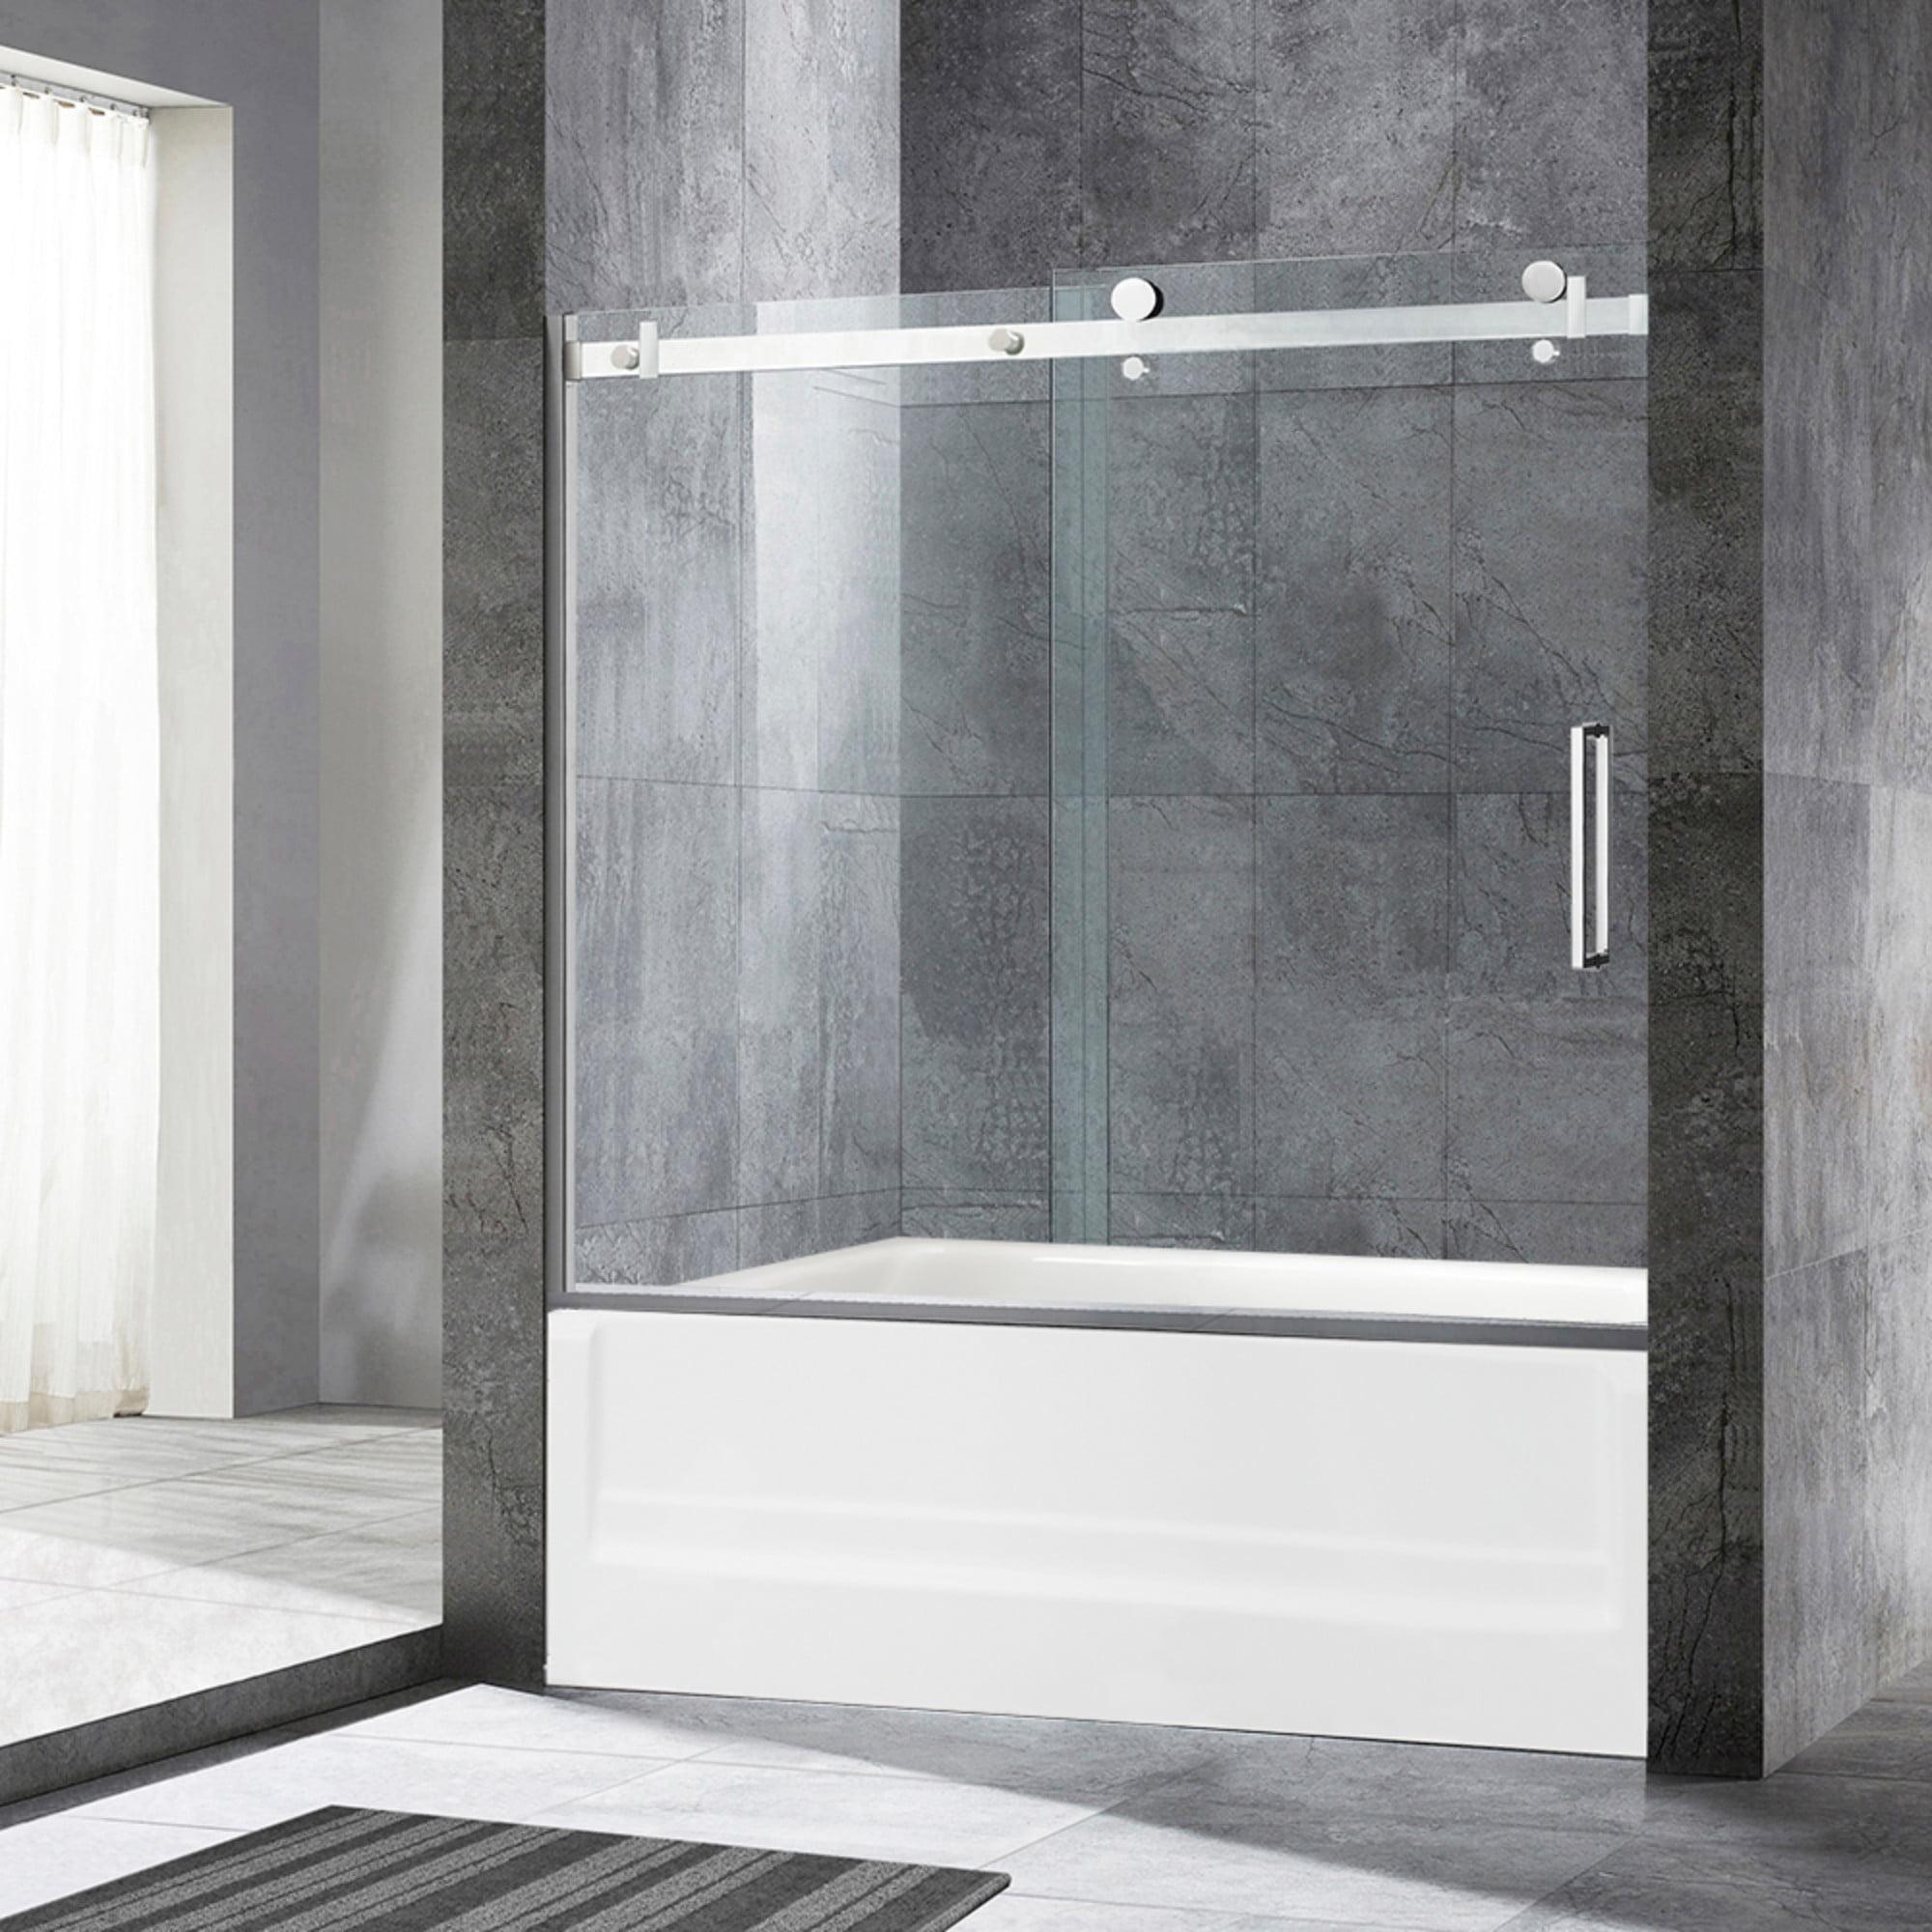 Woodbridge Deluxe Frameless Sliding Tub Door 5 16 Clear Tempered Glass Brushed Nickel Finish 60 X 62 Msdf6062 B Walmart Com